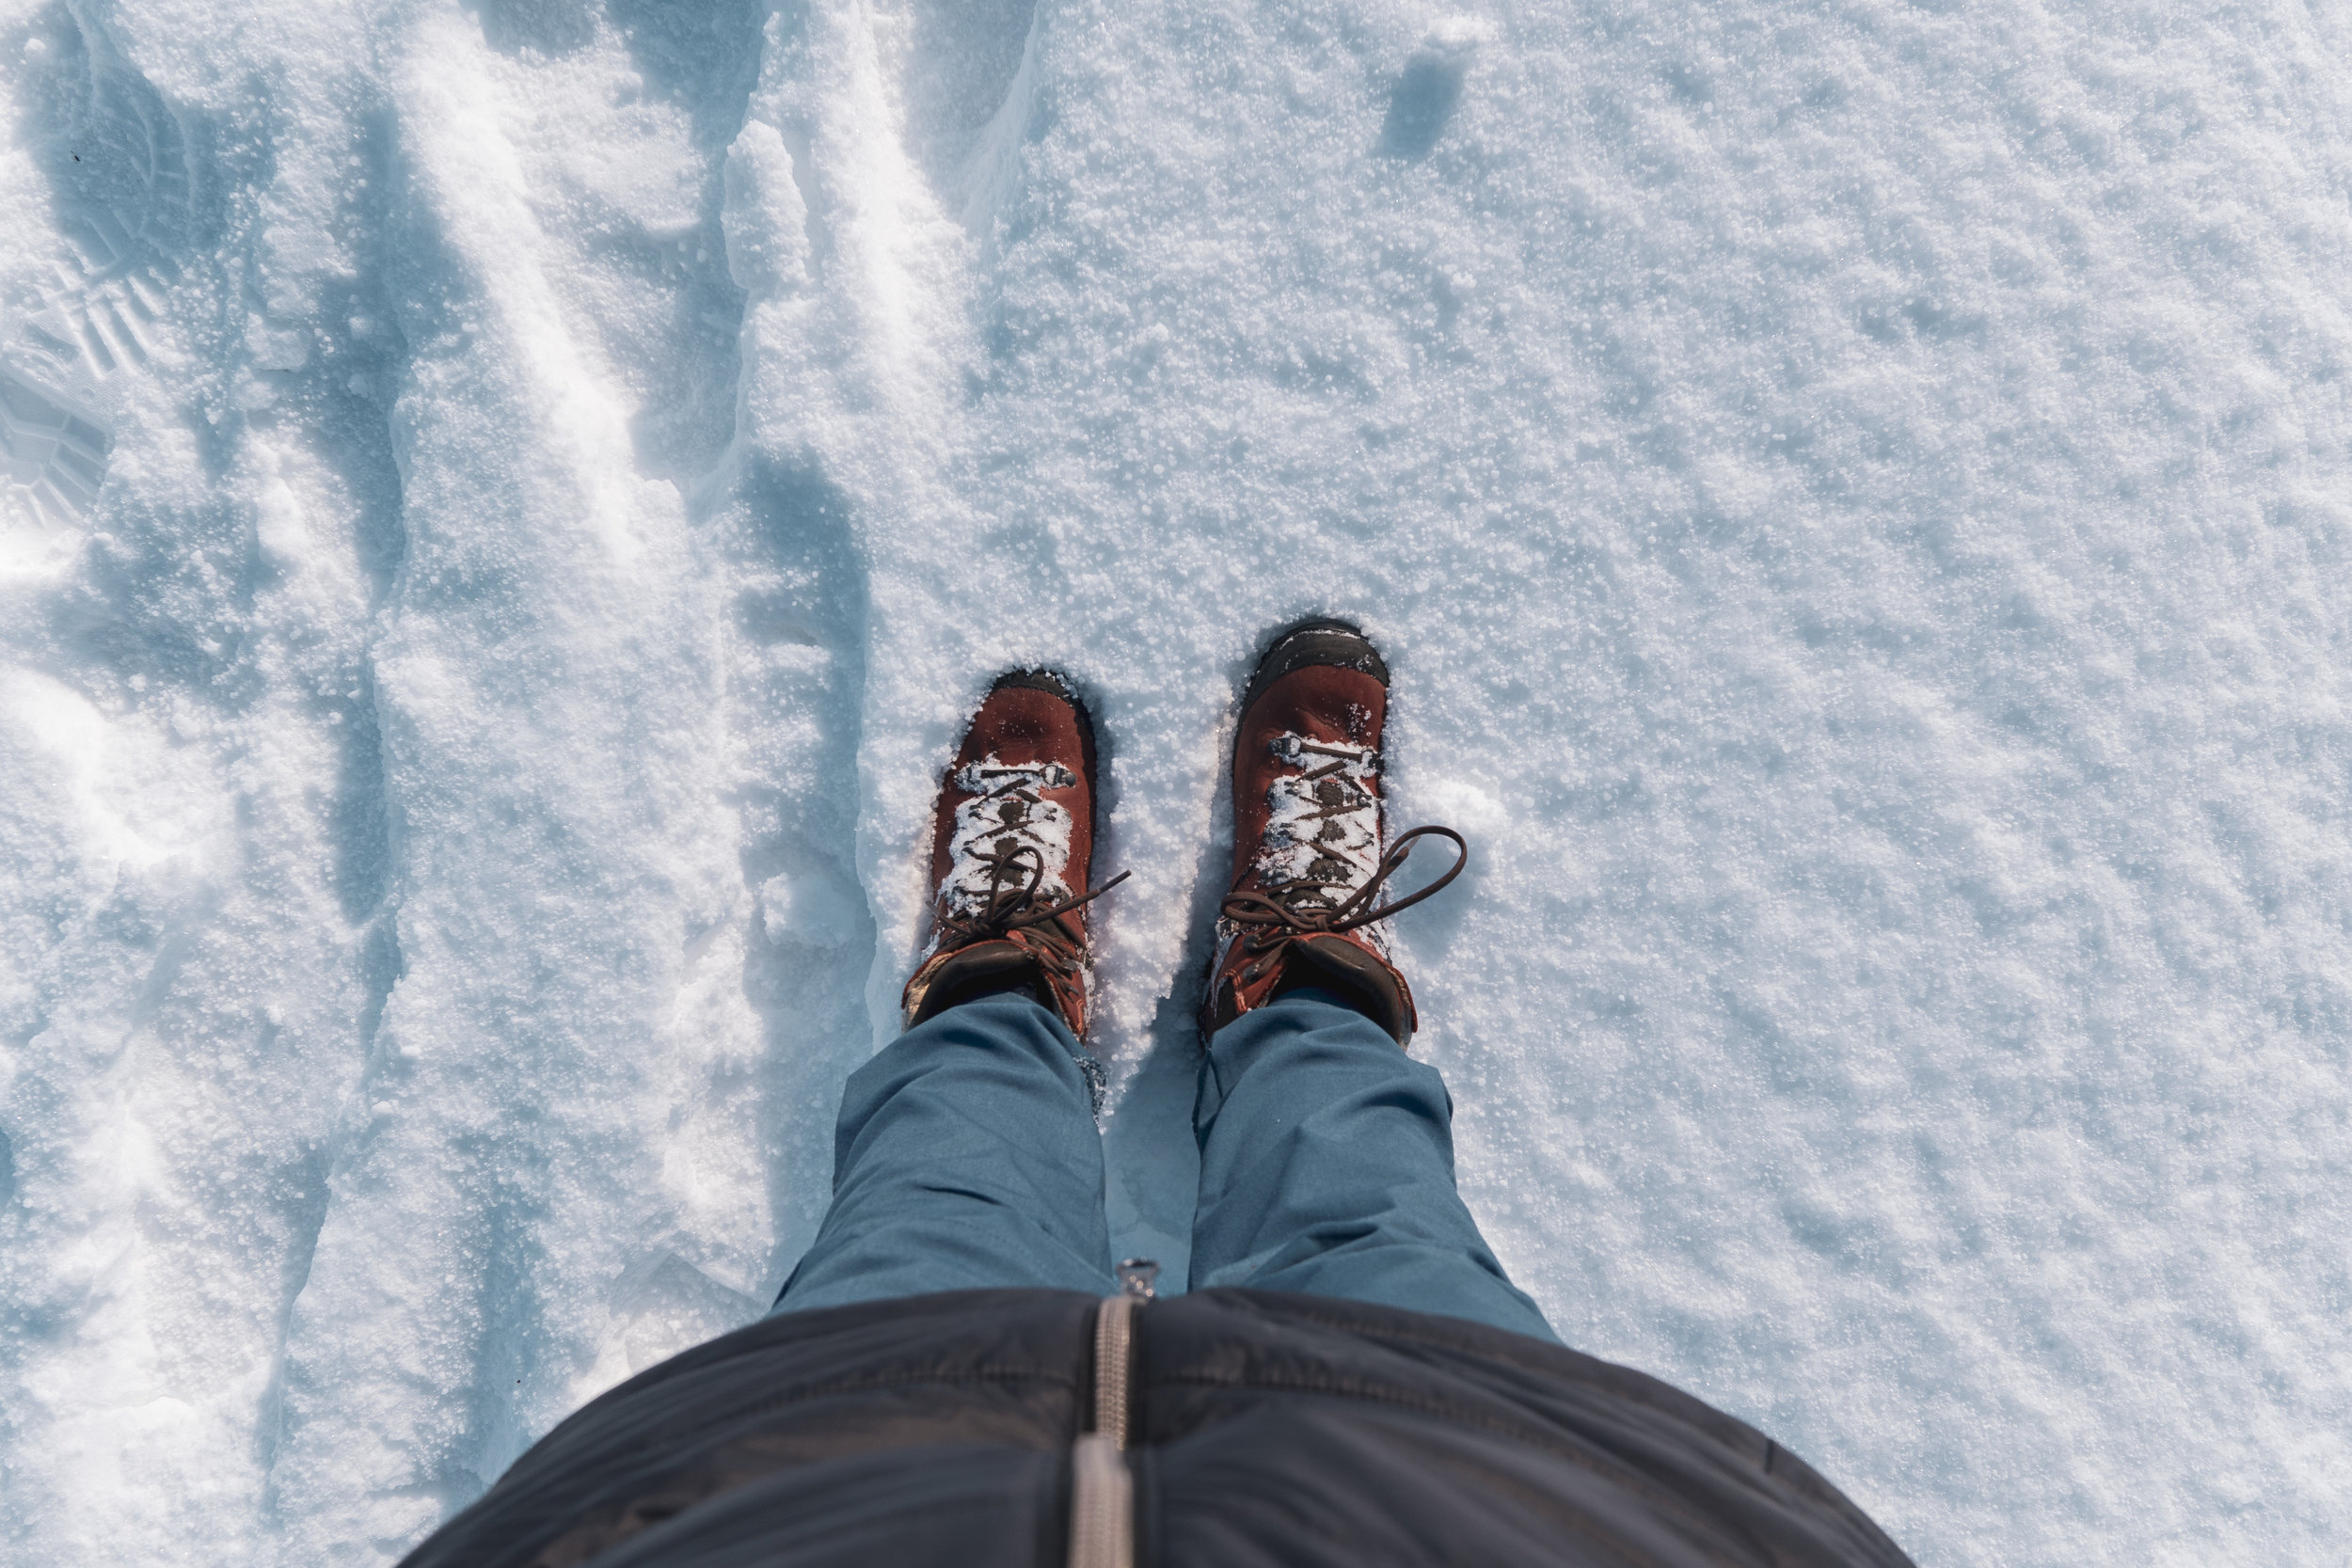 Isle-of-Skye-Winter-2019-Trotternish (19).jpg